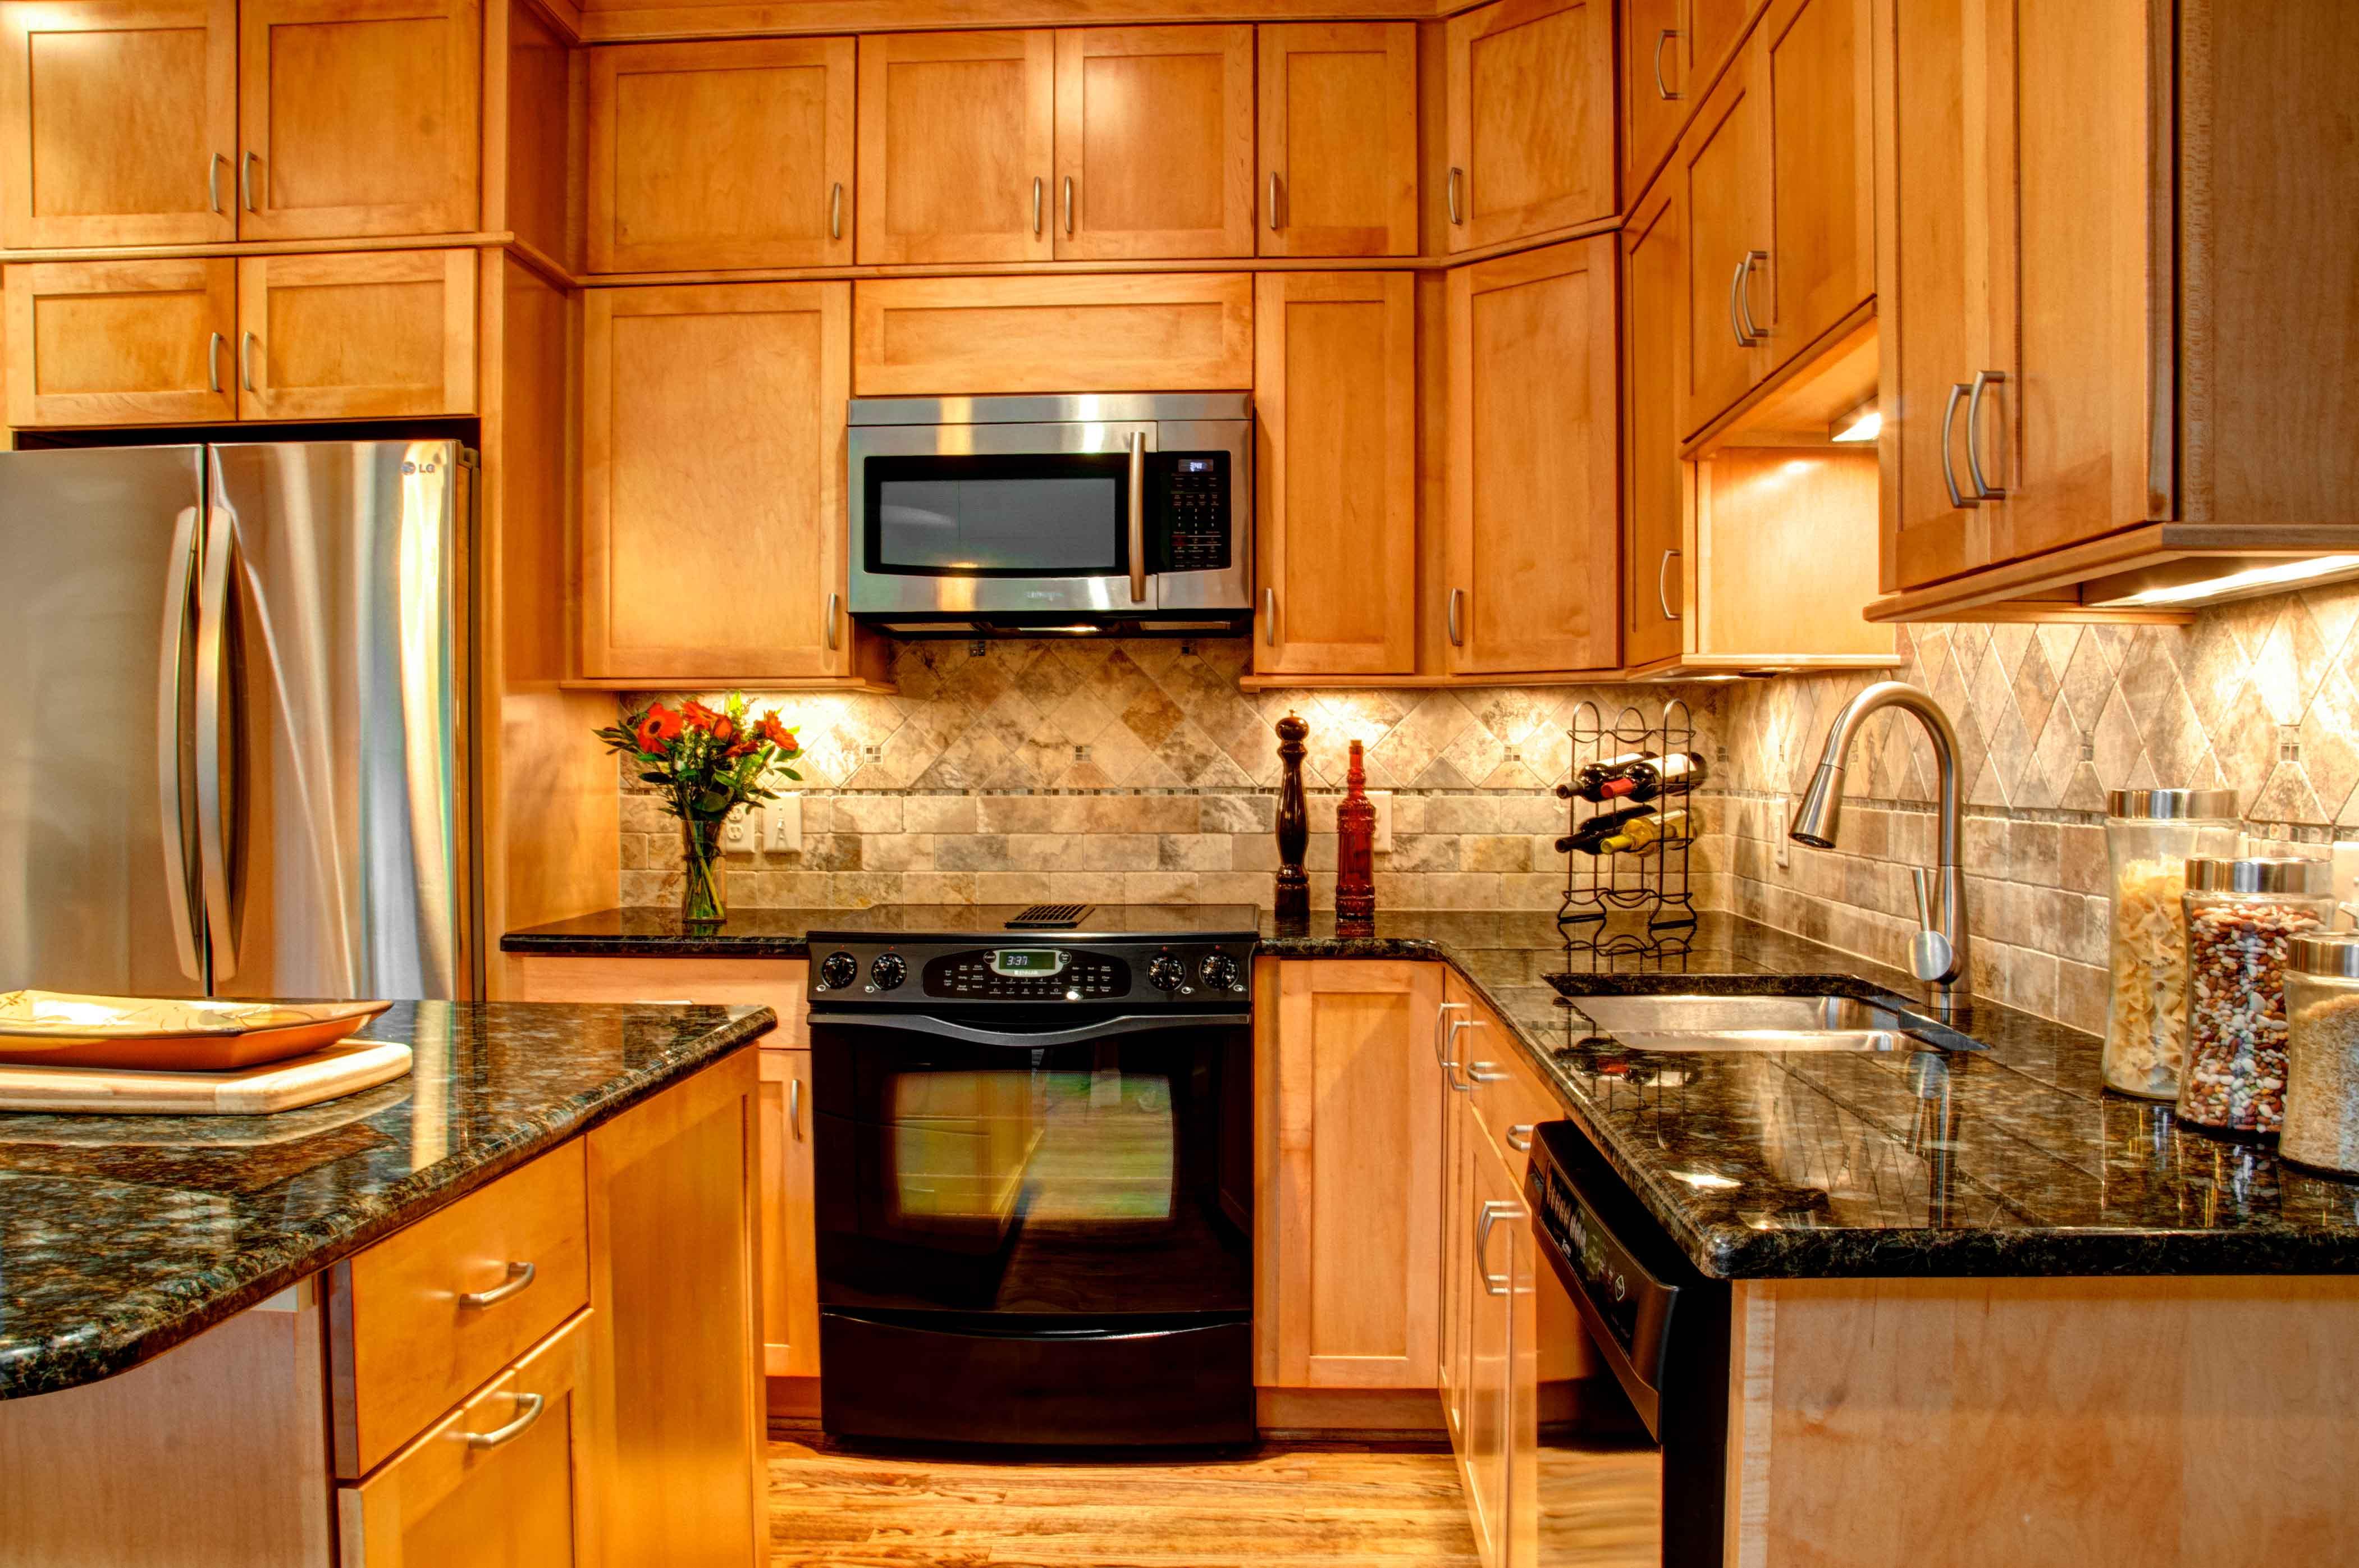 kraftmaid kitchen cabinets pricing kraftmaid kitchen cabinet prices How To Get Kraftmaid Cabinet With Er Price Home And Kraftmaid Kitchen Cabinet Demo